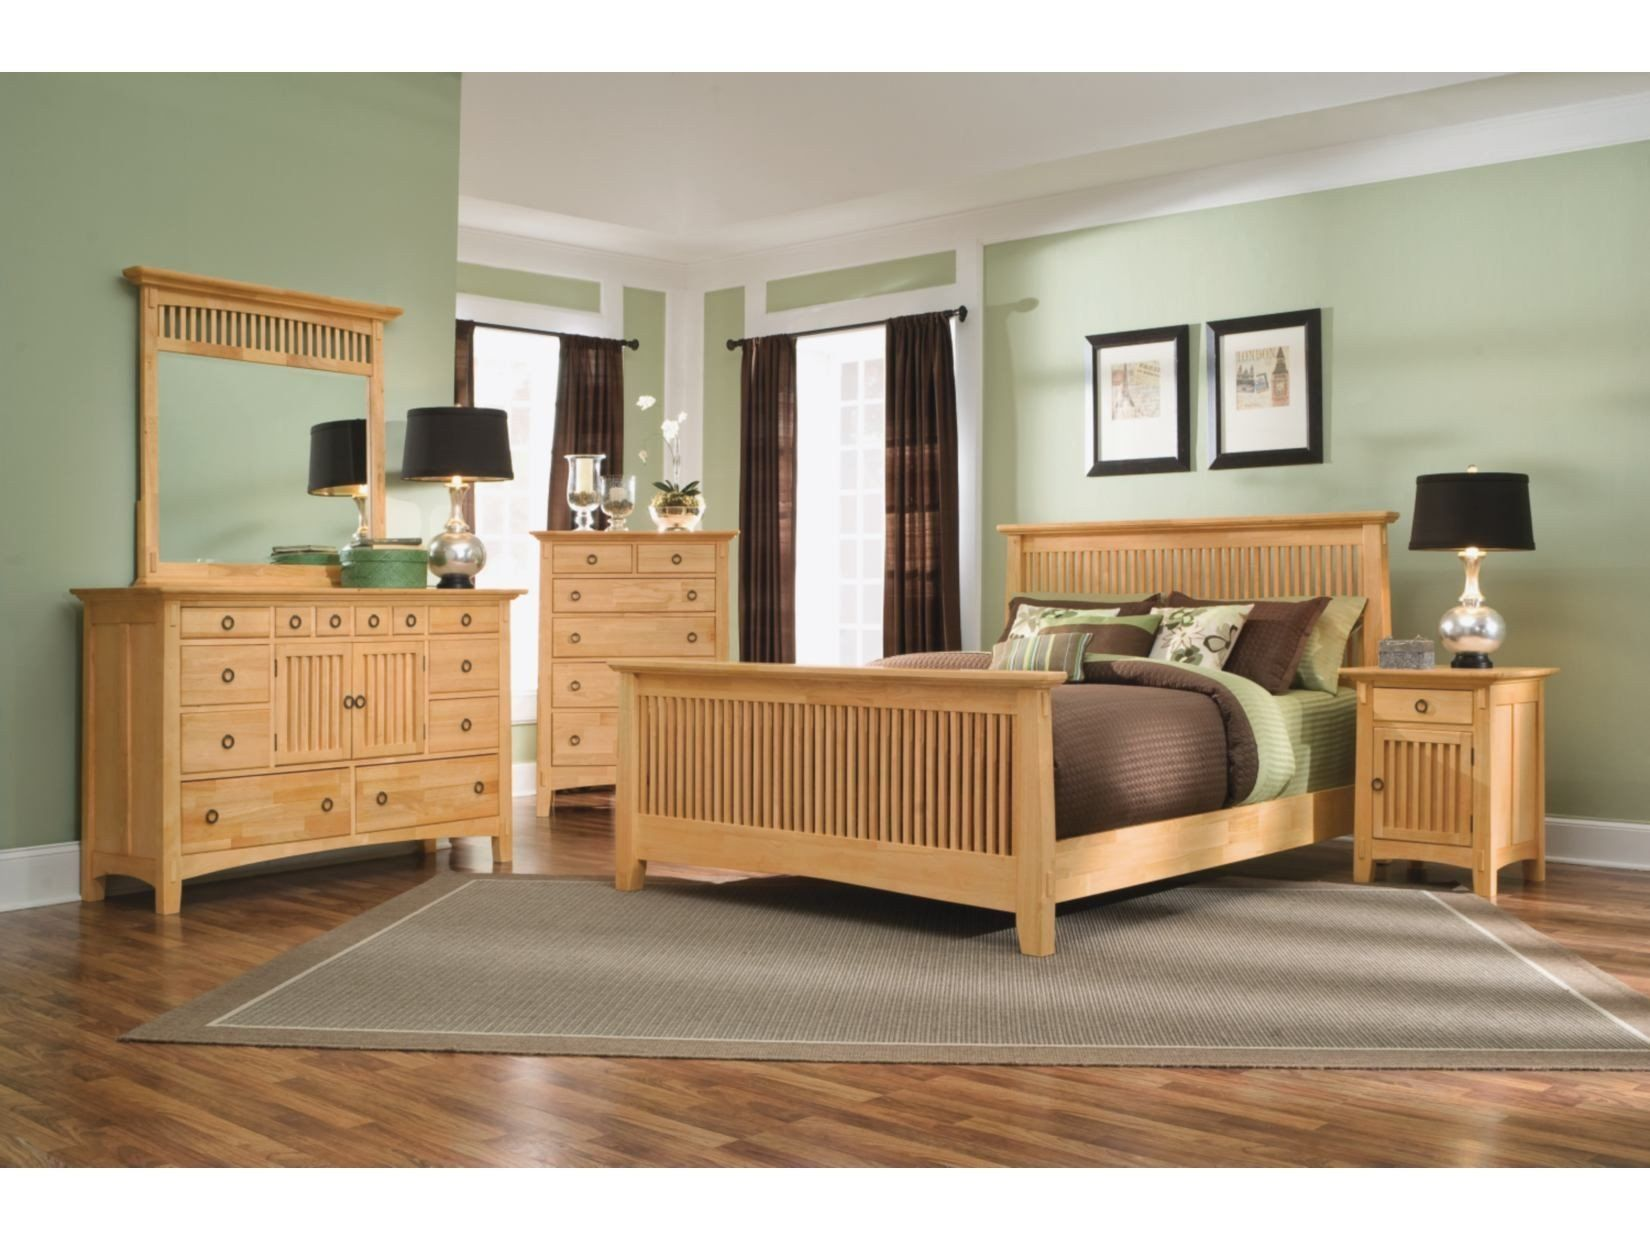 20 Beautiful Natural Wood Bedroom Set In 2020 Bedroom Furniture